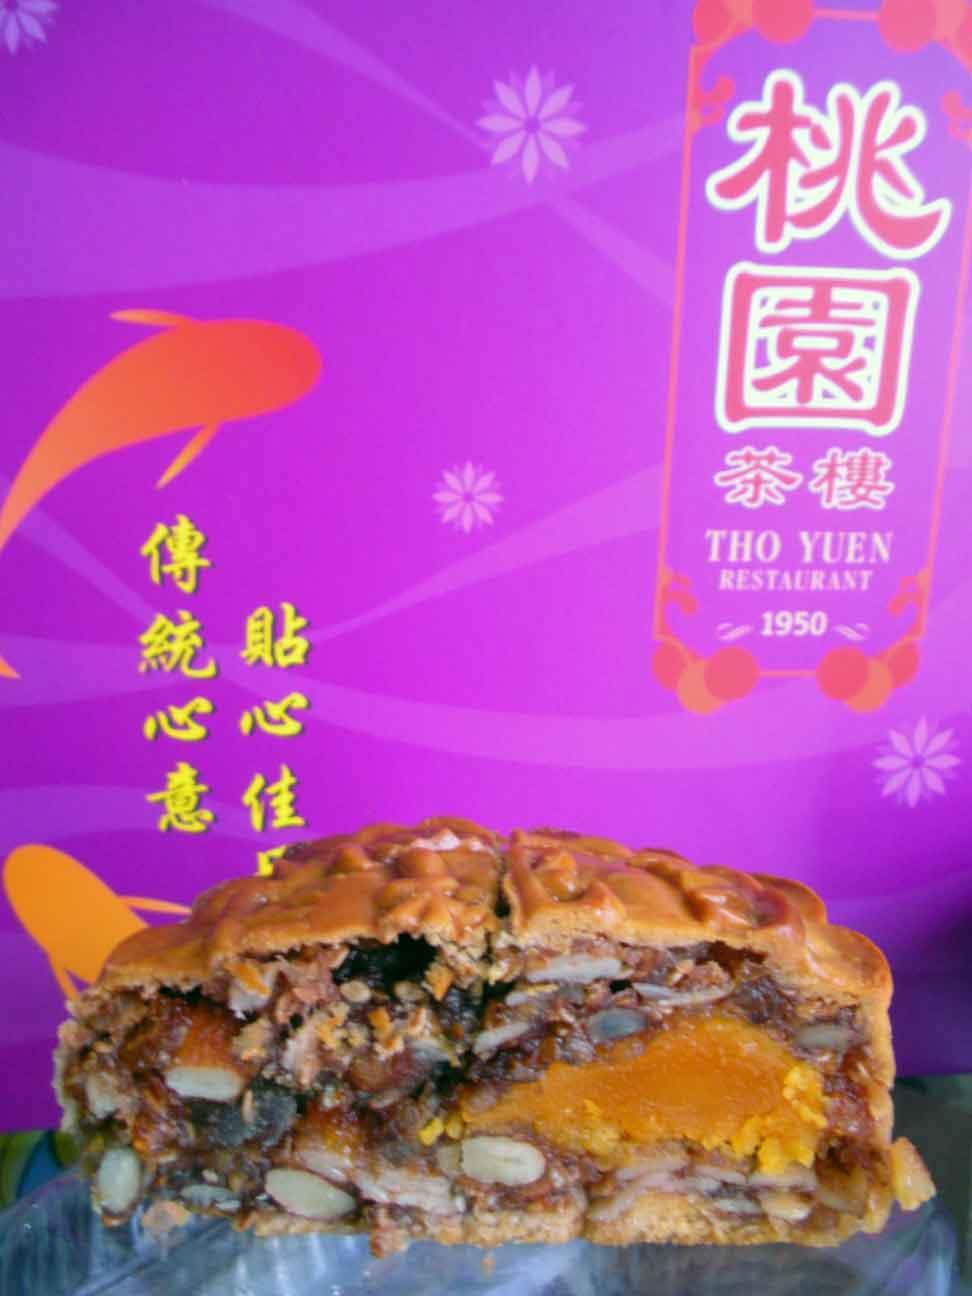 Tho Yuen Ean Thui Mooncake